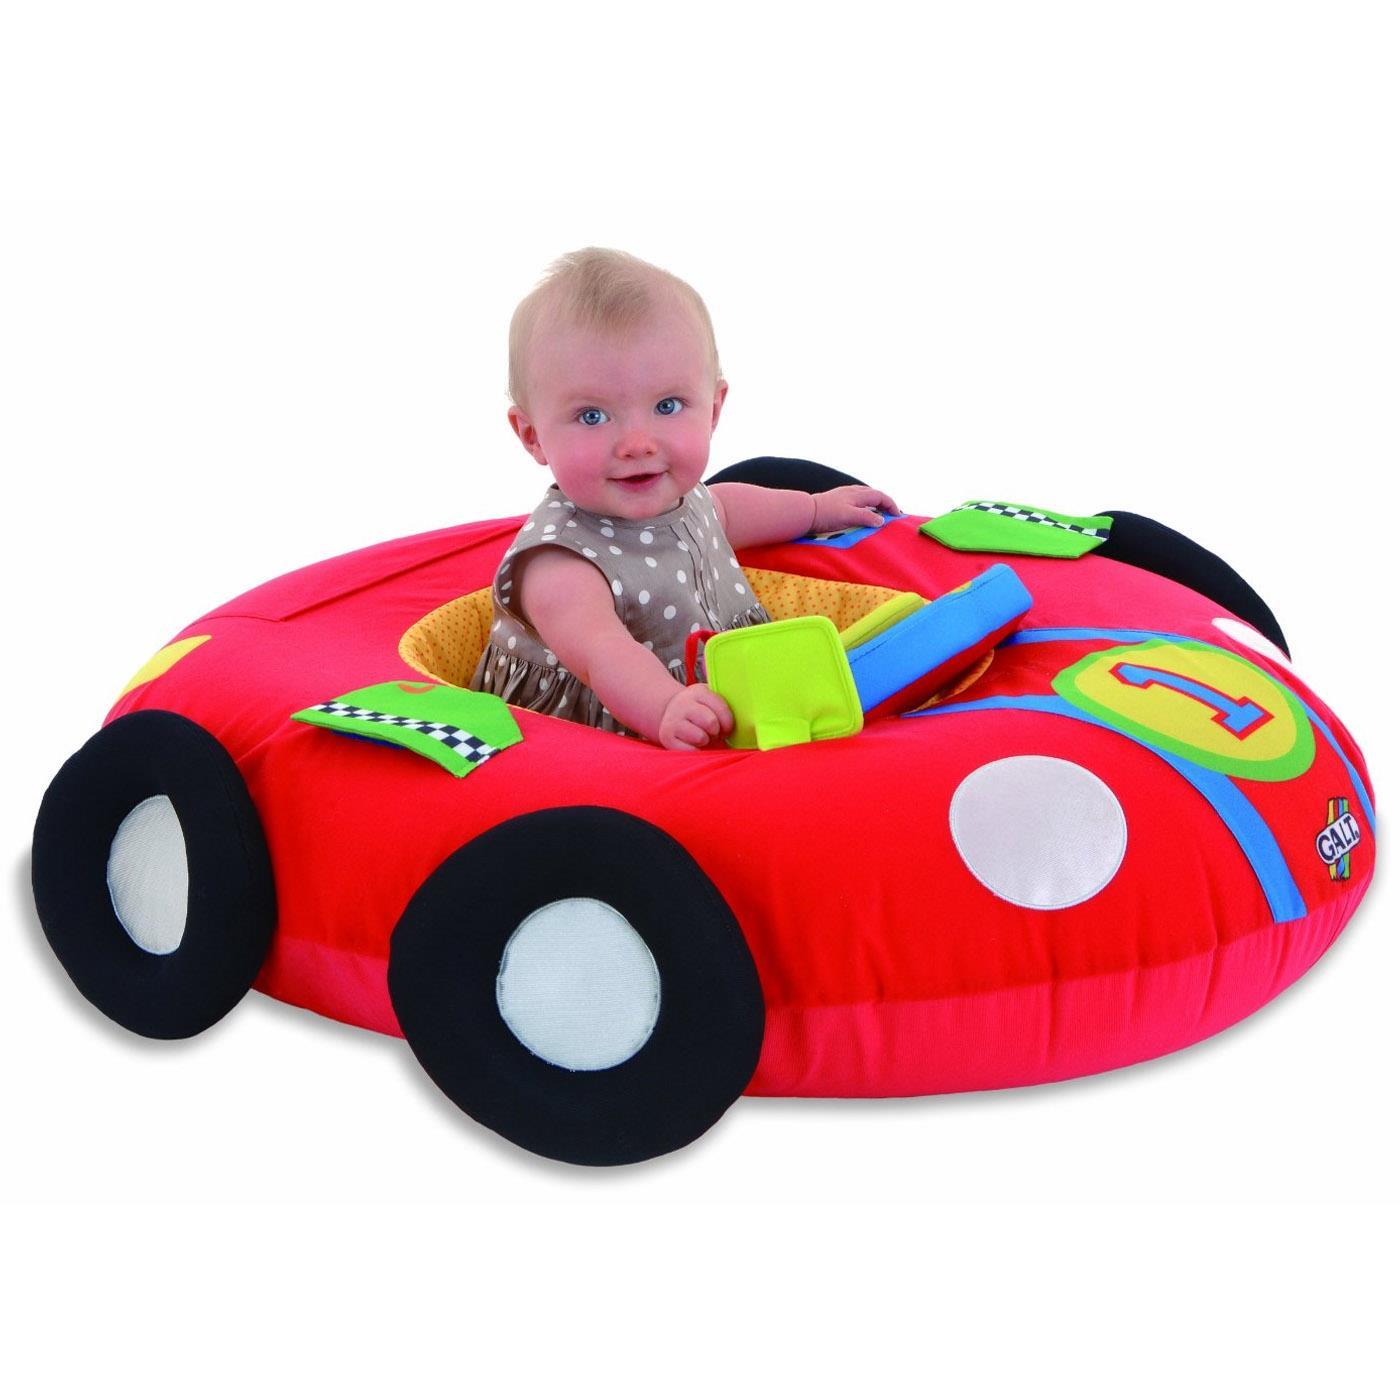 Galt Toys 1003871 Playnest Car| Blink Kuwait